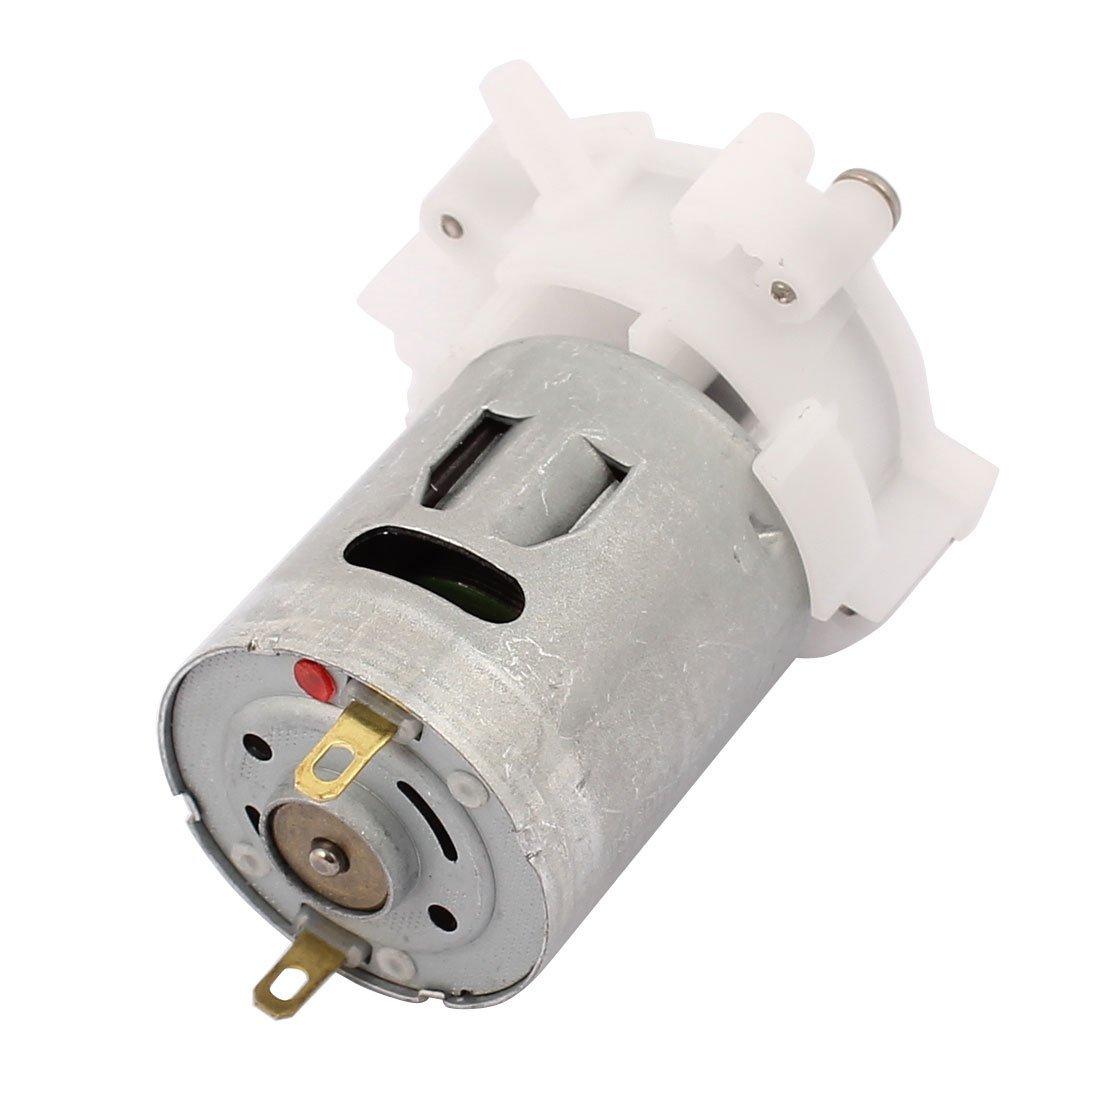 eDealMax eDealMax (R) CC 3-6V de agua eléctrico de bombeo Micro motor de la bomba RS-360 - - Amazon.com